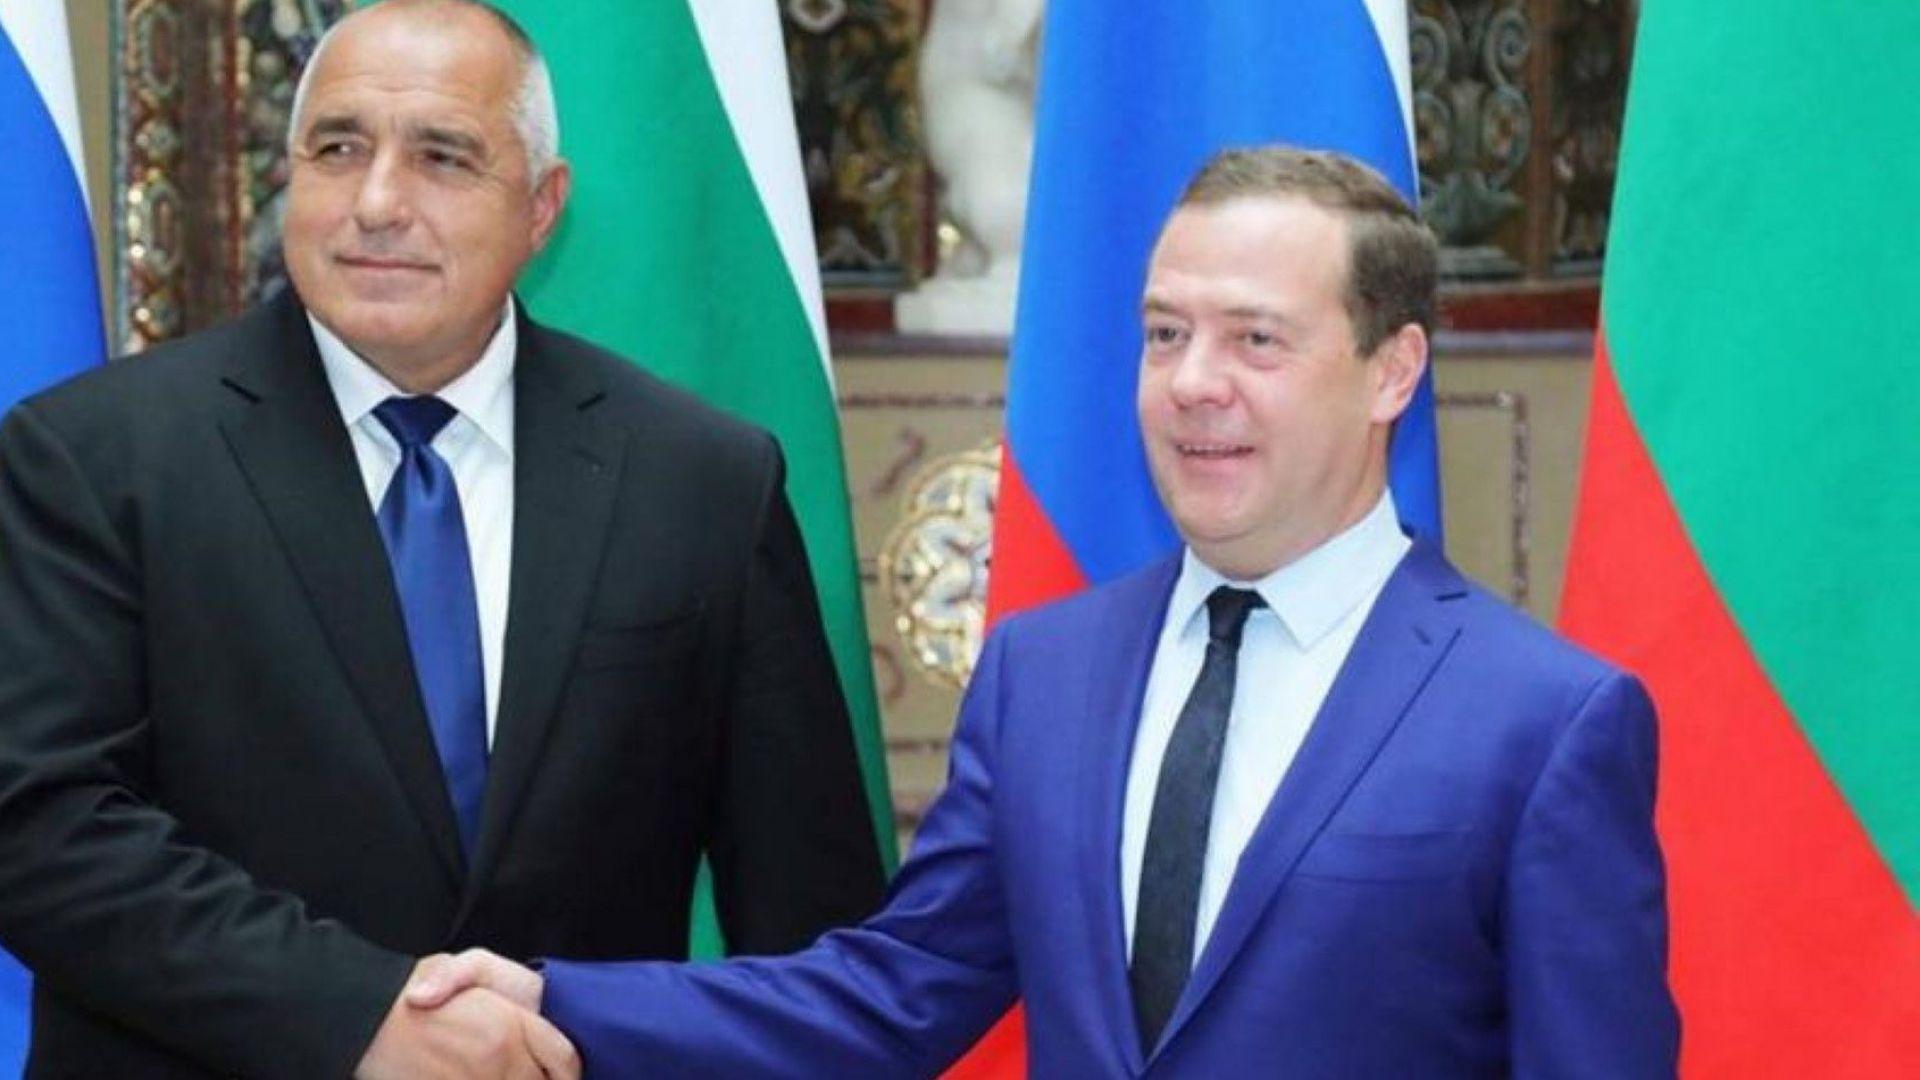 Бойко Борисов посреща Дмитрий Медведев в София на 4 и 5 март